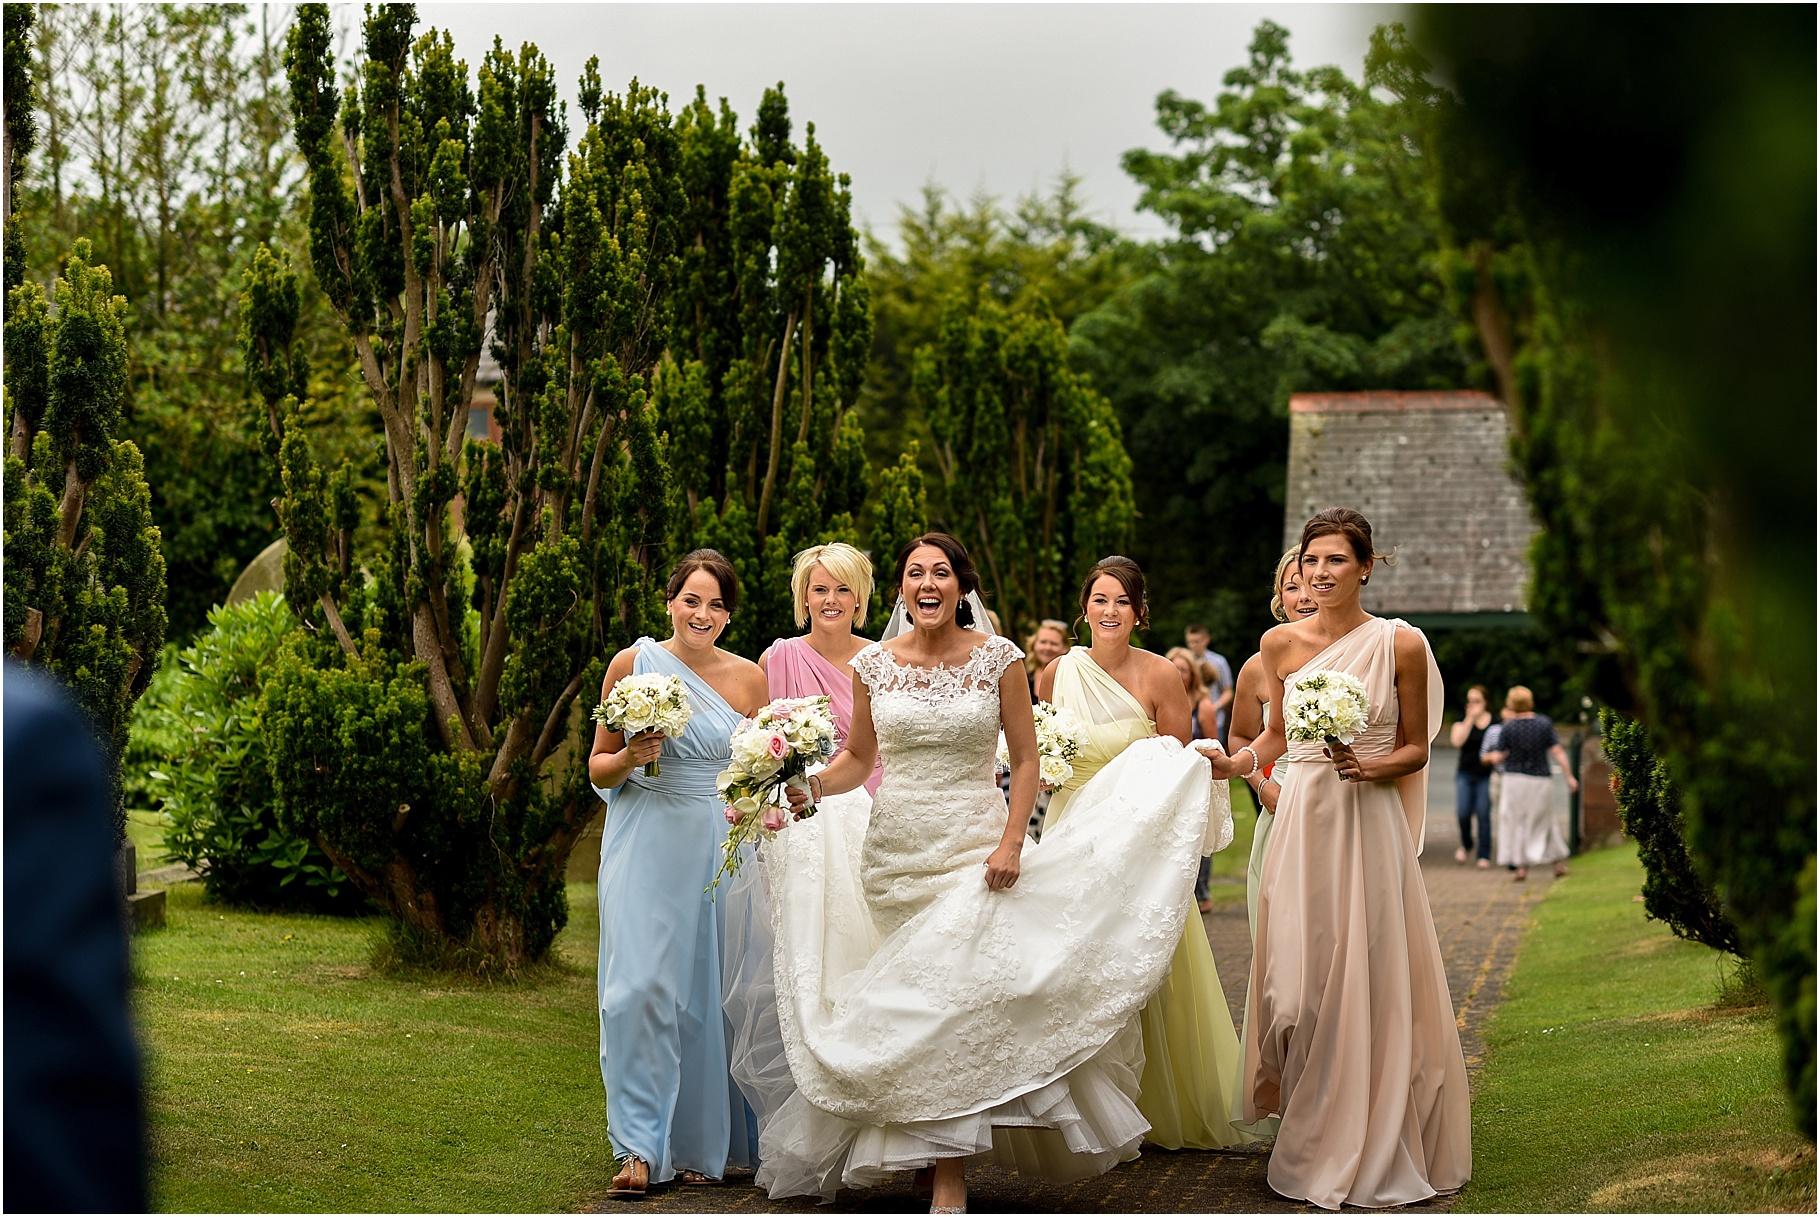 lancashire-marquee-wedding-032.jpg